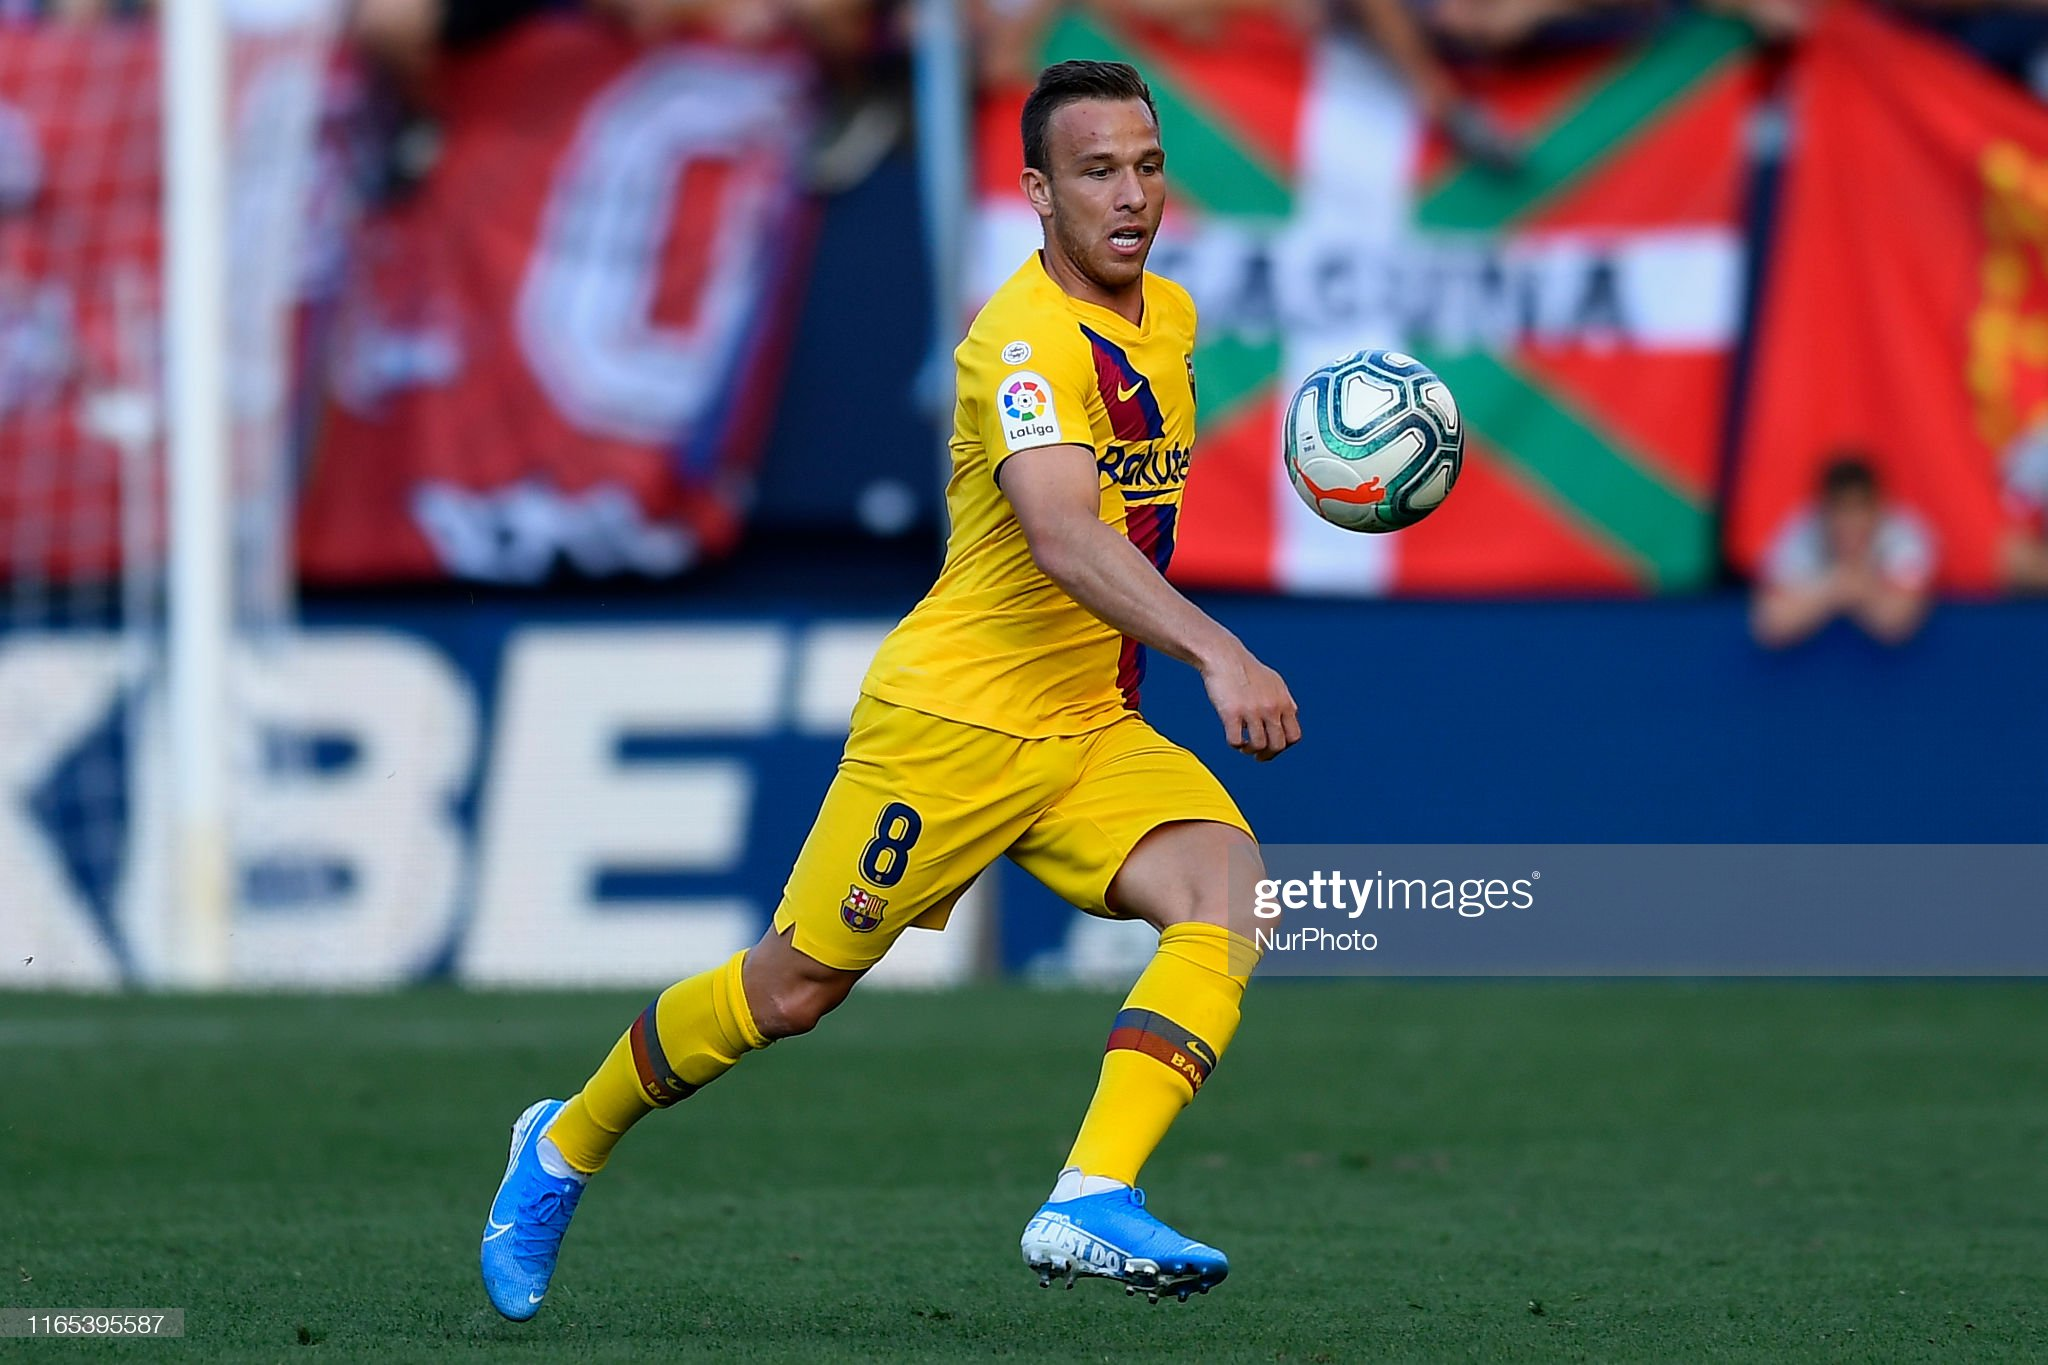 صور مباراة : أوساسونا - برشلونة 2-2 ( 31-08-2019 )  Arthur-melo-of-barcelona-in-aciton-during-the-liga-match-between-ca-picture-id1165395587?s=2048x2048